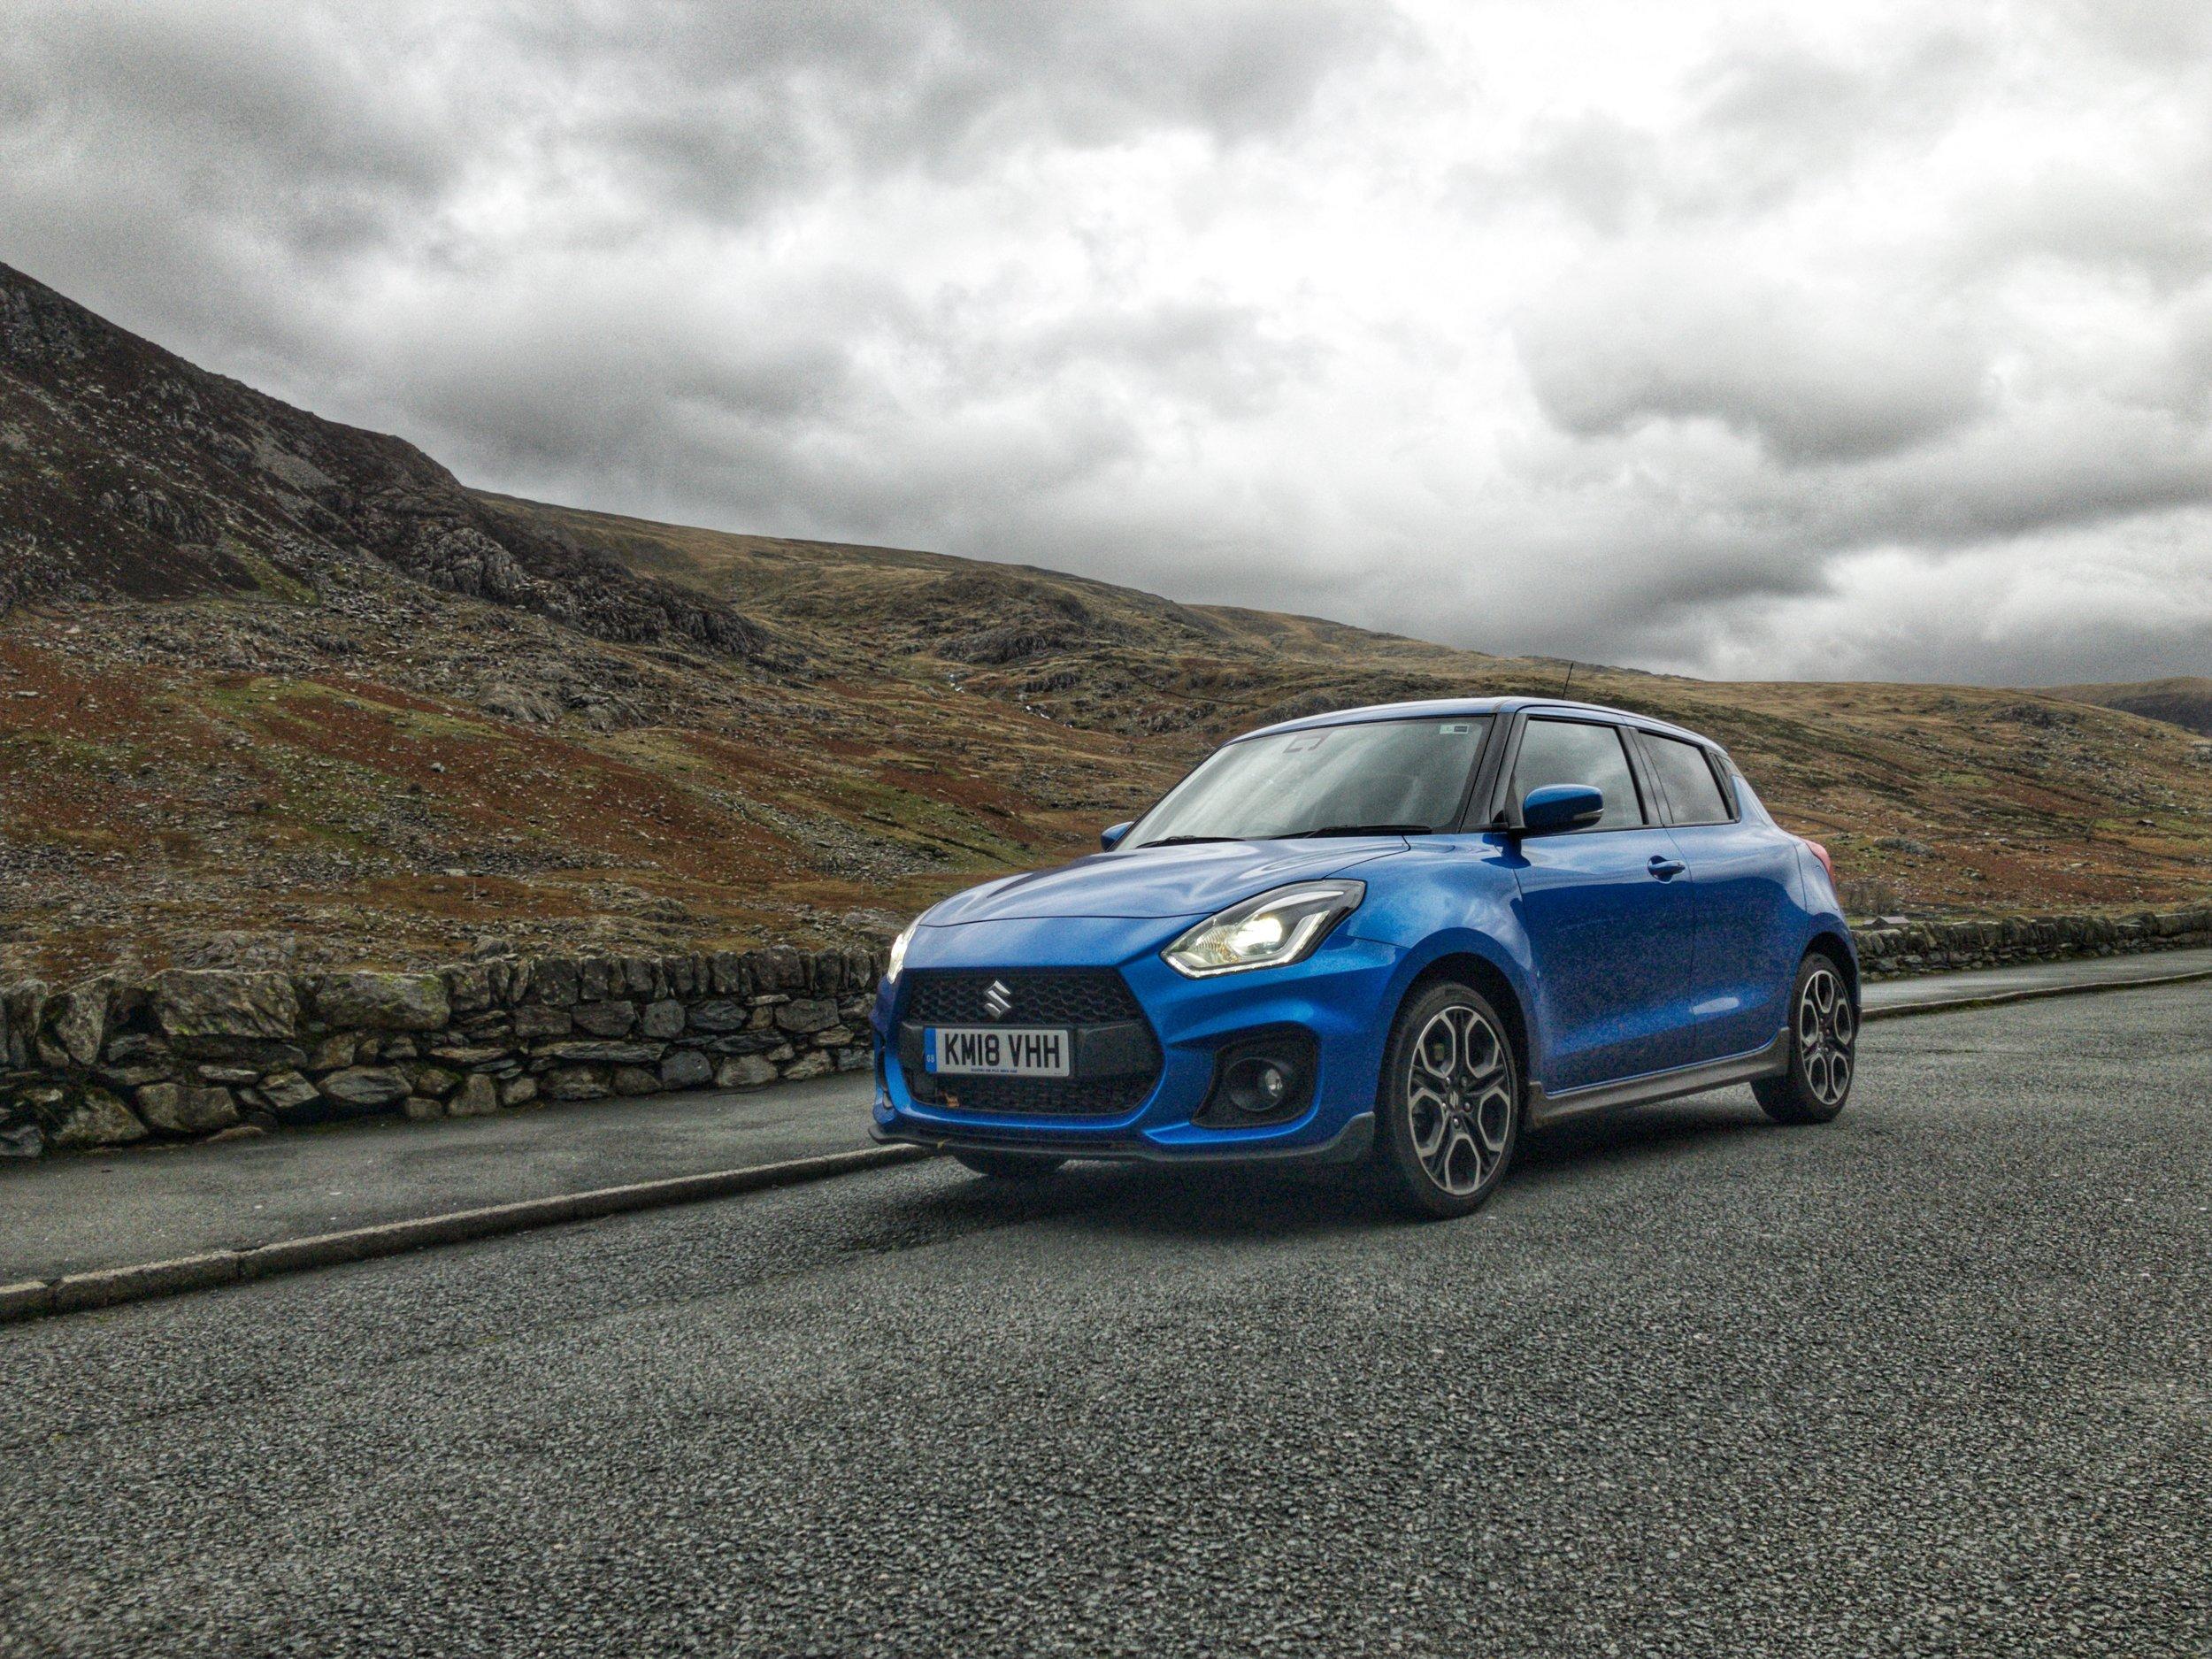 Suzuki Swift admiring the North Wales scenery